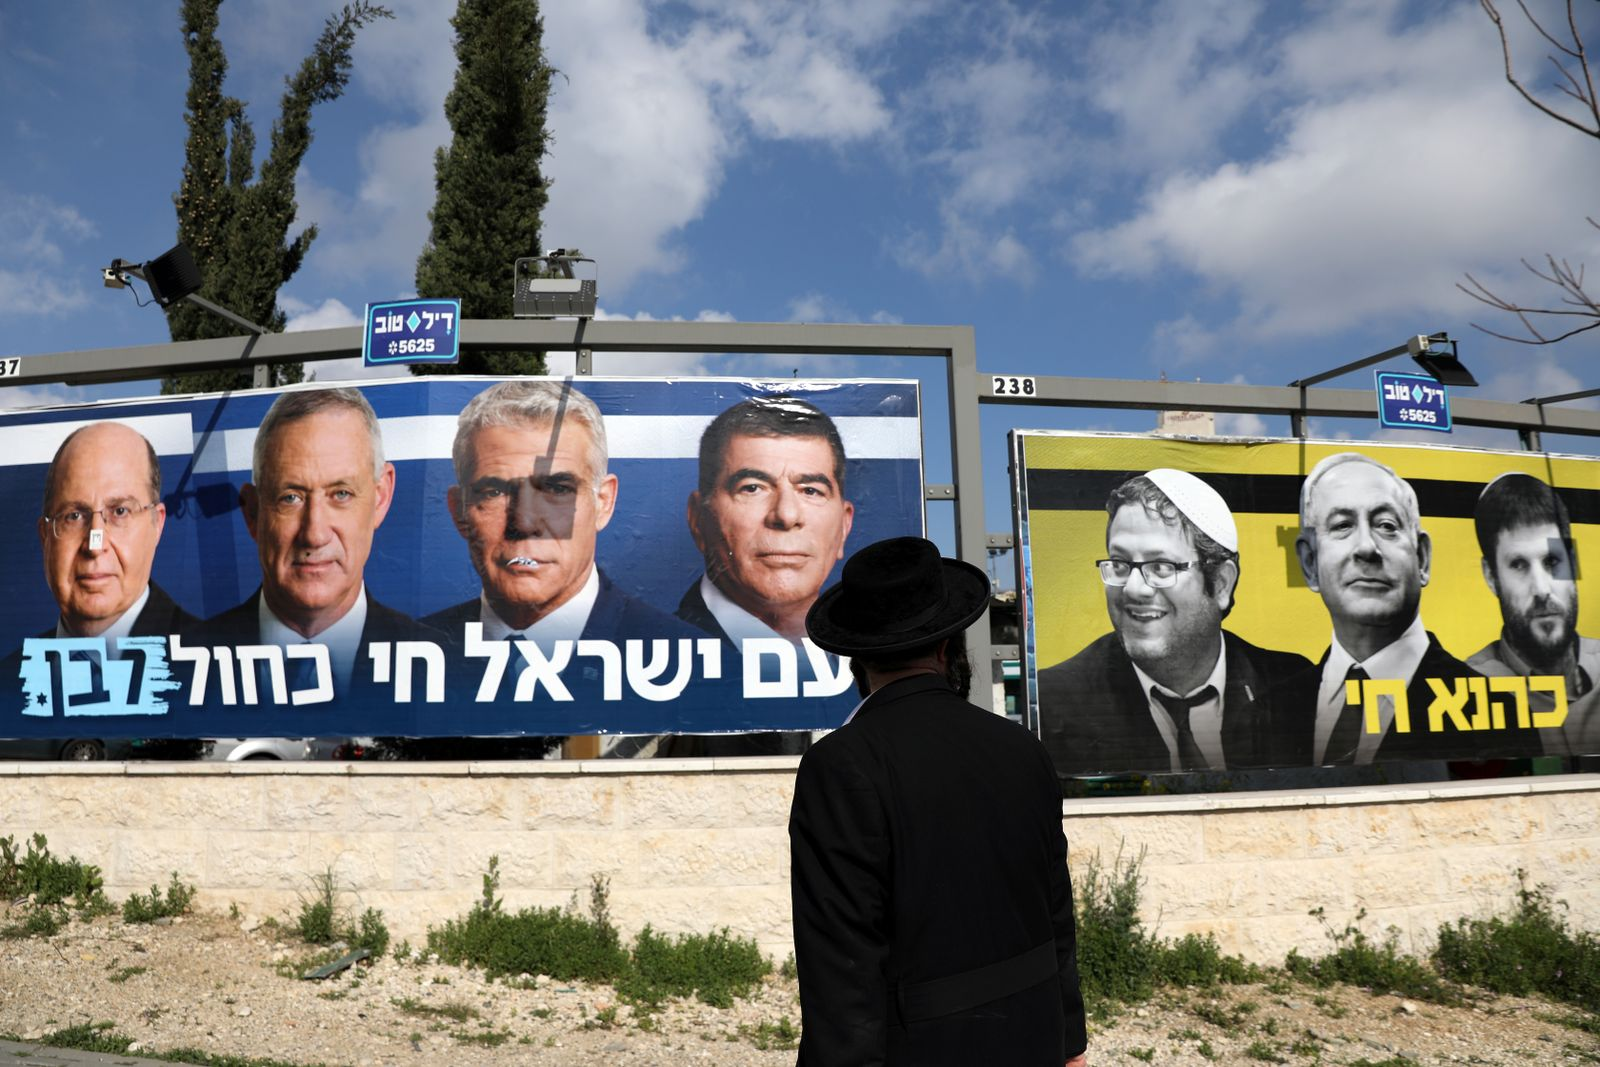 ISRAEL-ELECTION/